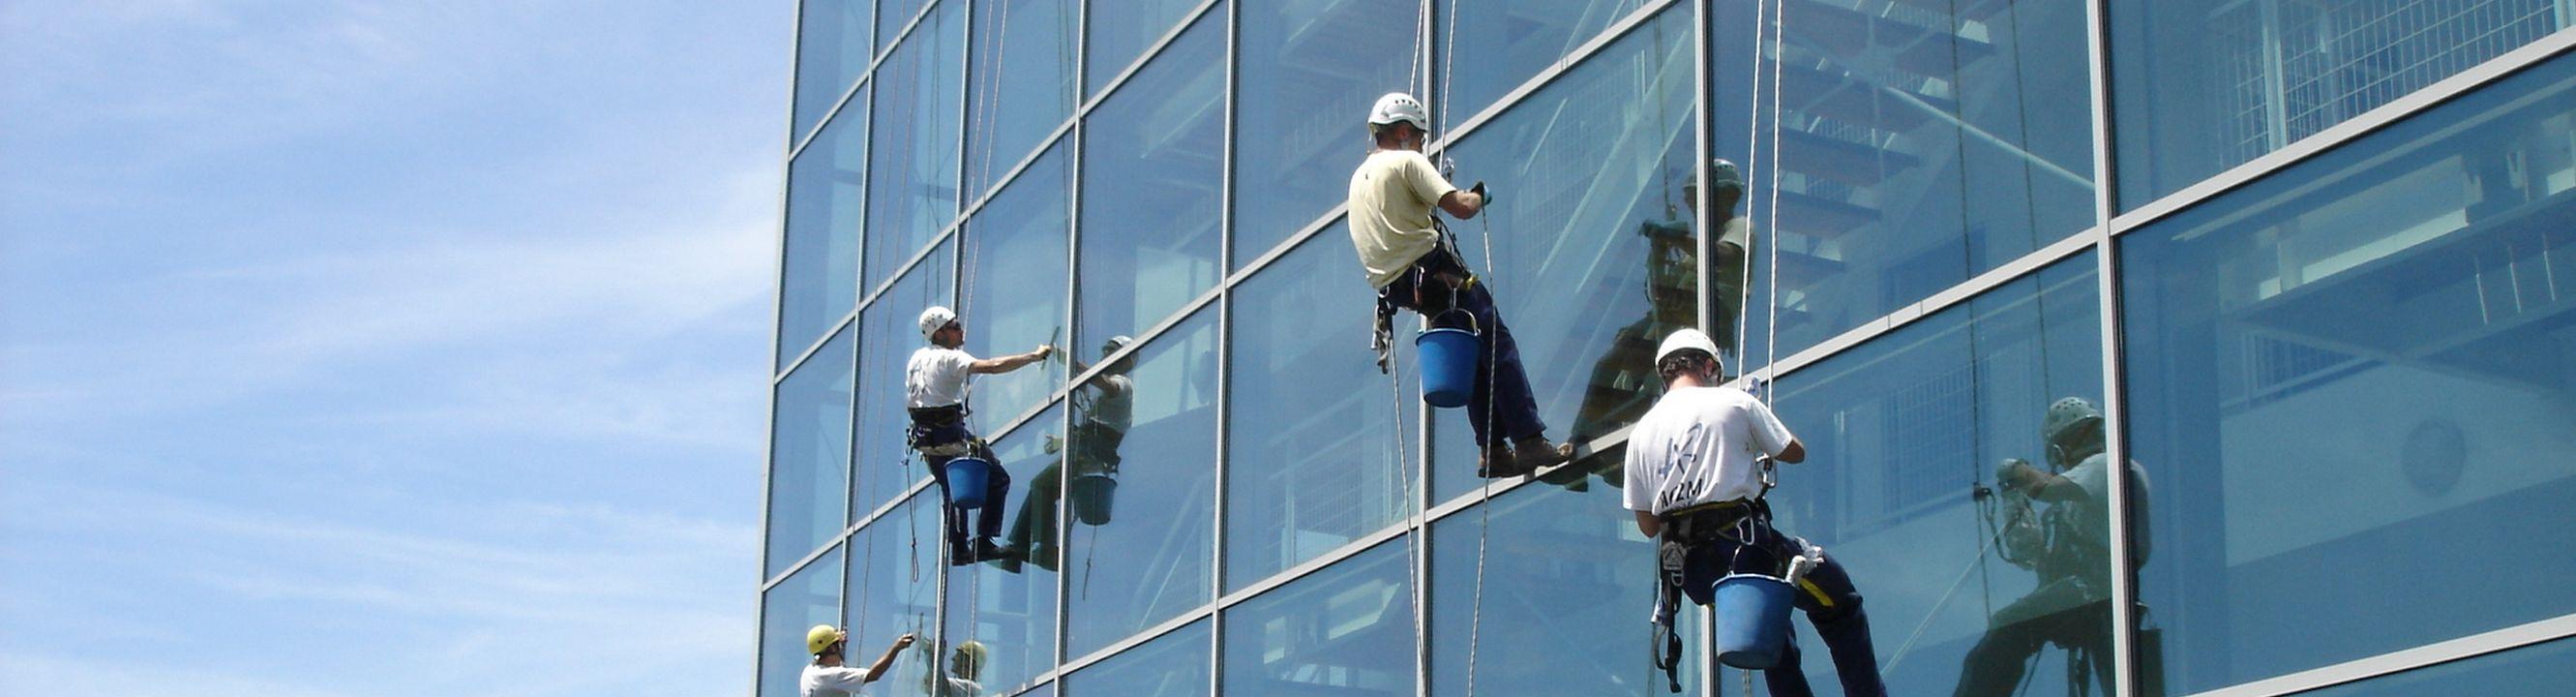 technicien cordiste urbain mulhouse lavage nettoyage de vitre façade